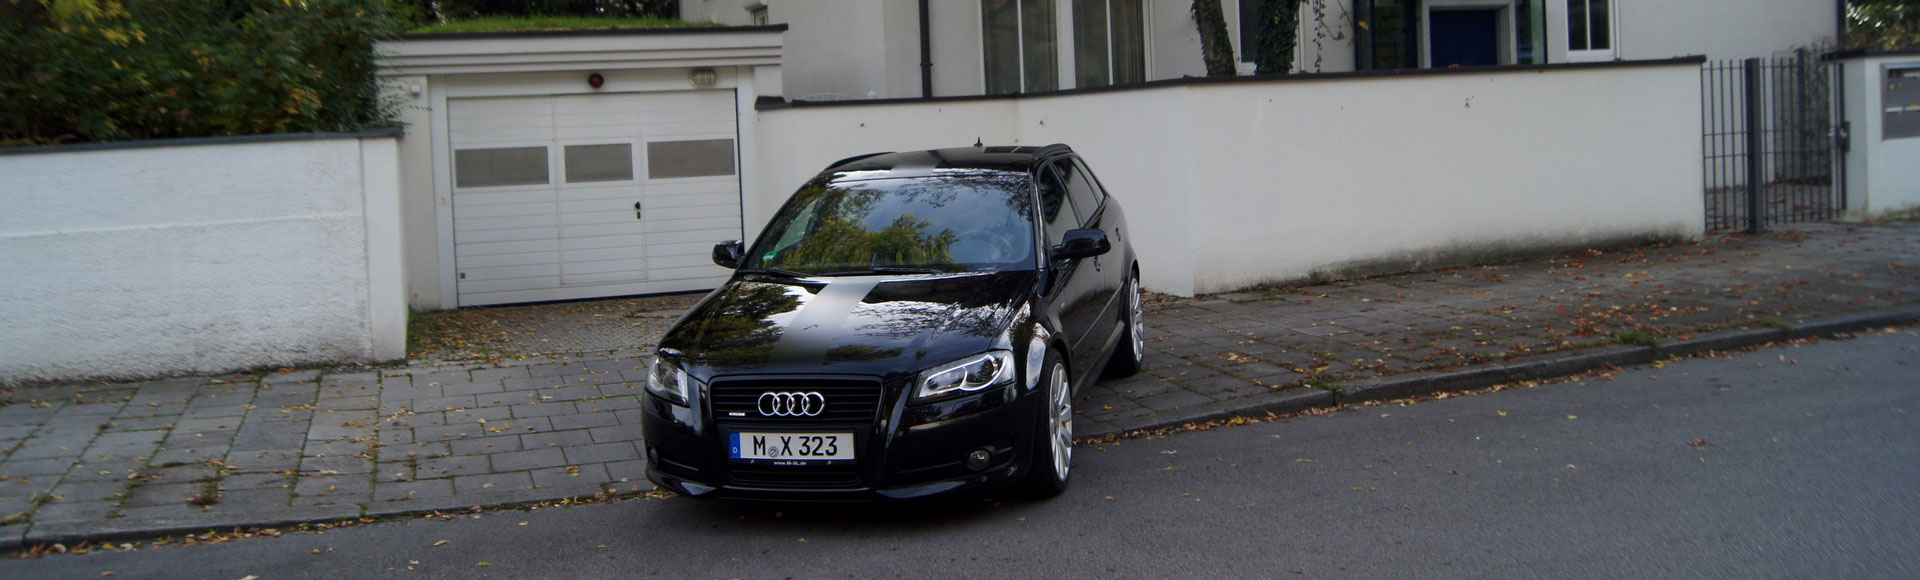 Audi A3 Sportback 2011 Herbst 8776